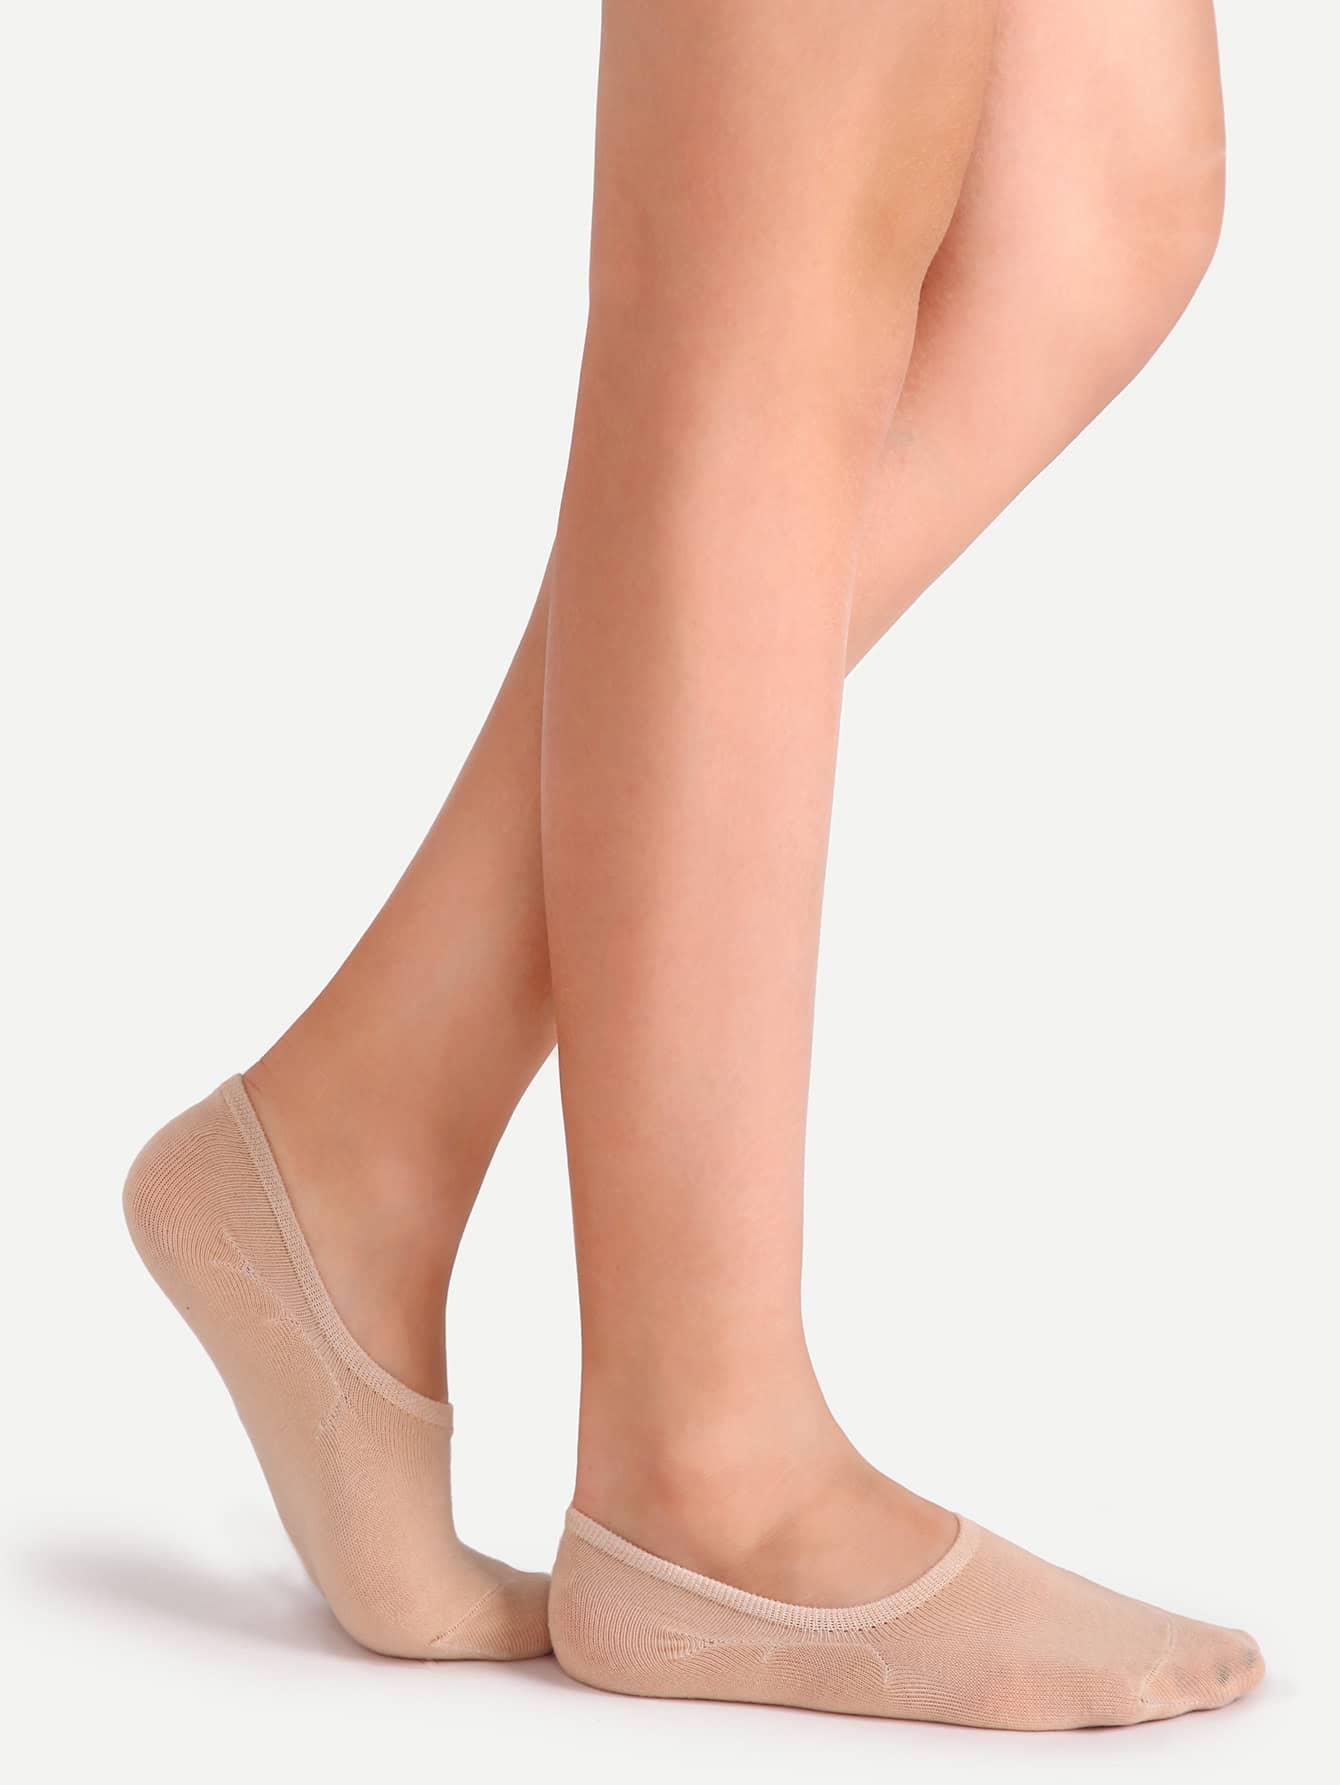 Nude No Show Socks For Women sock161028301